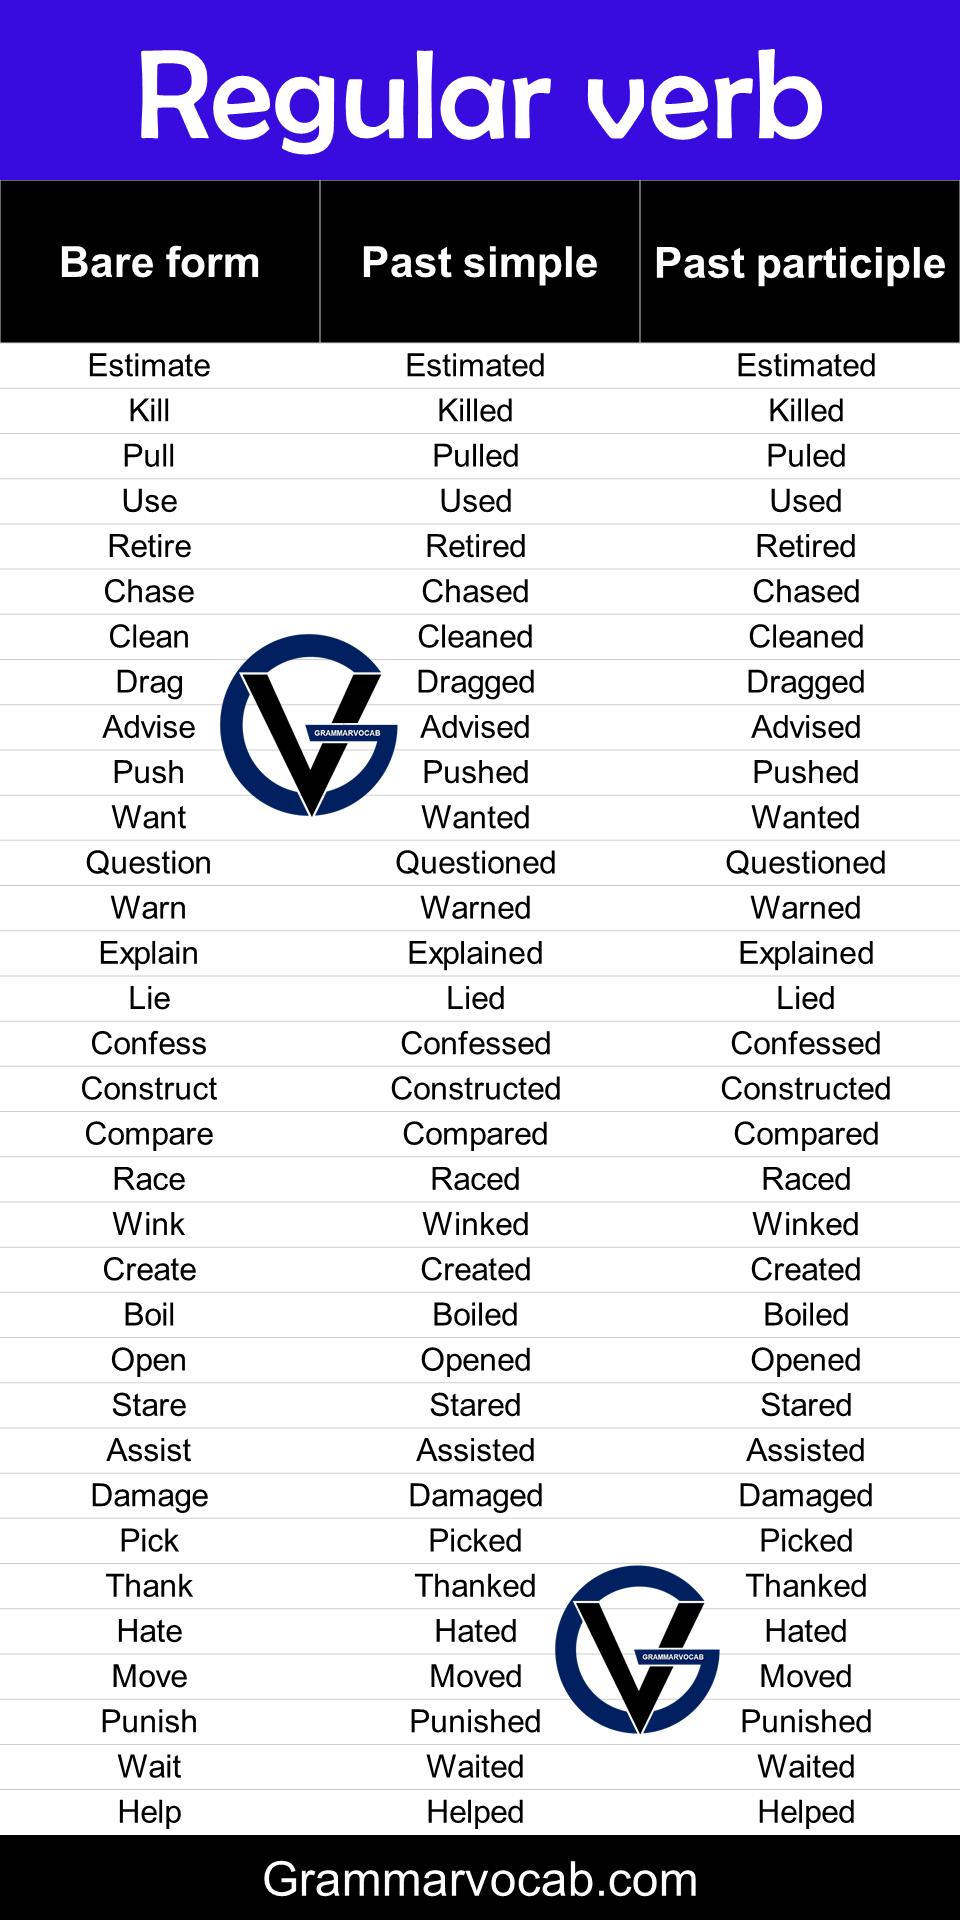 Regular Verb List